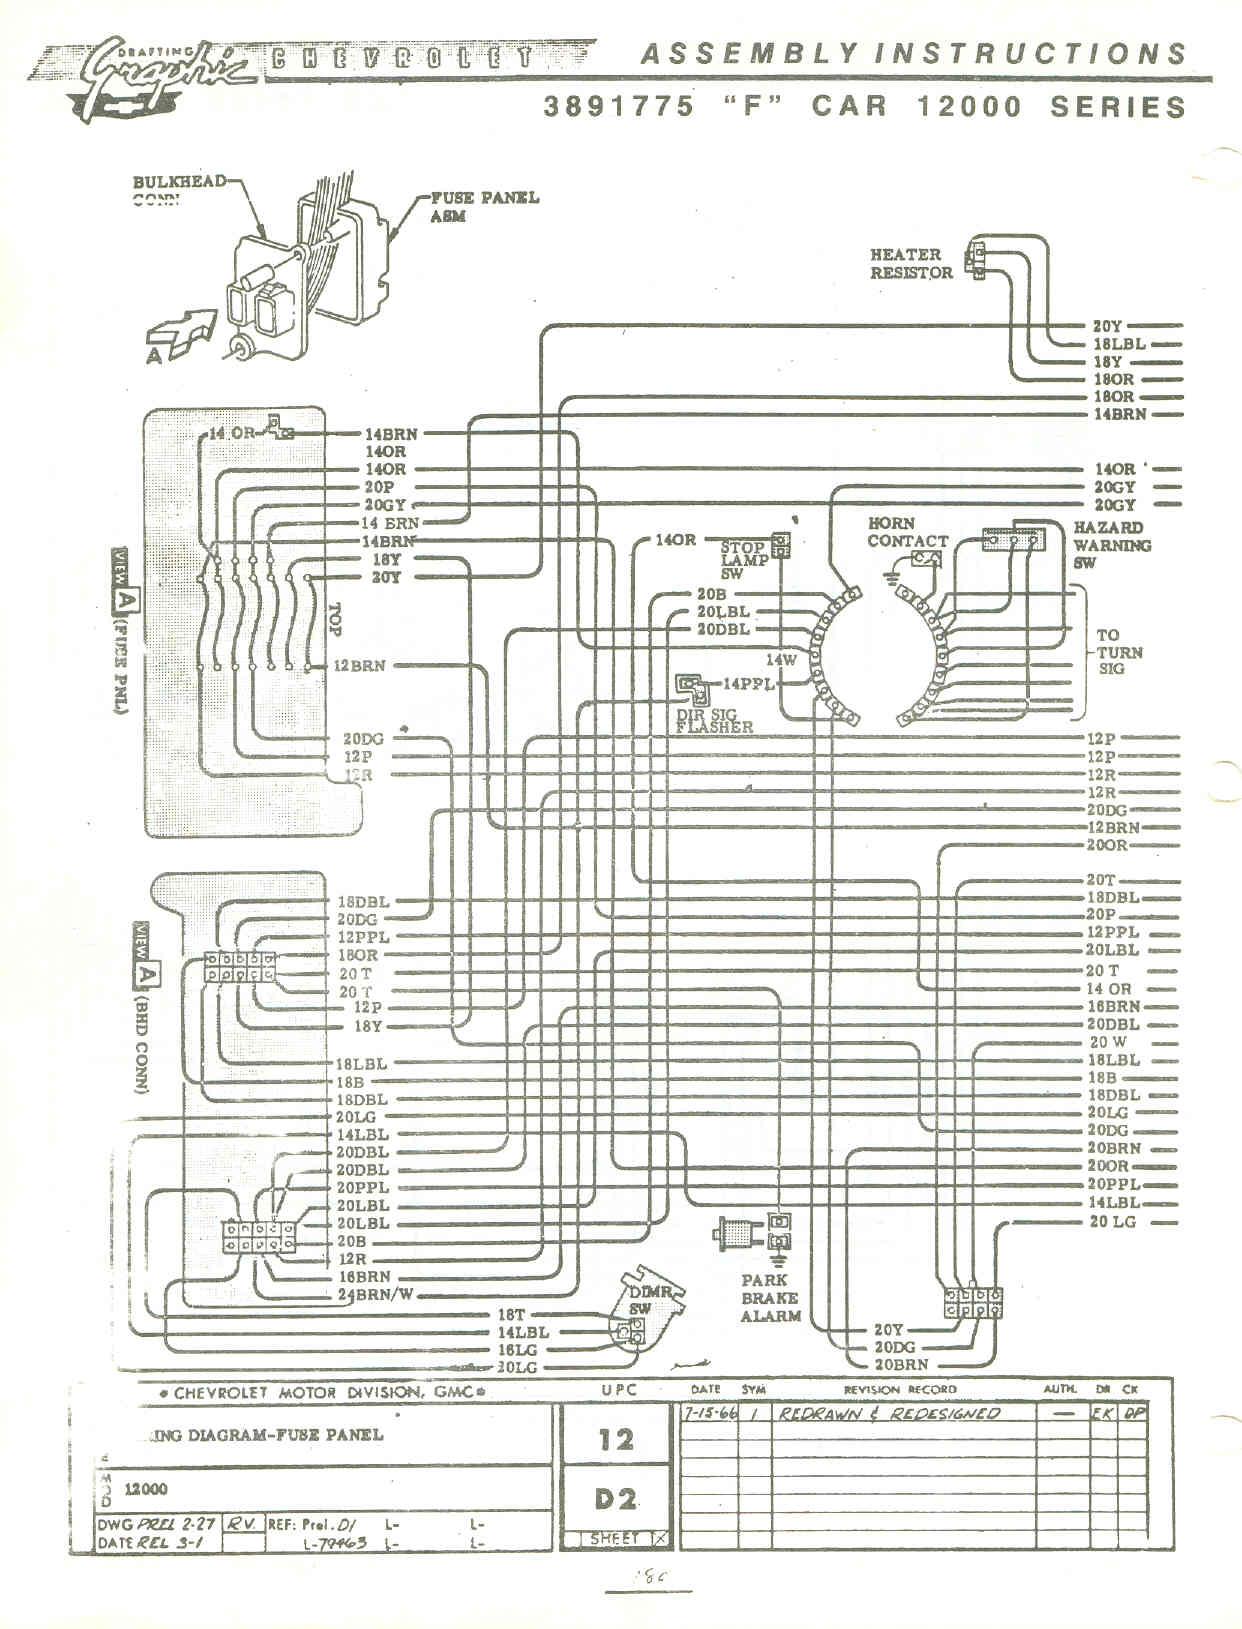 1967 camaro wiring diagram telephone stencil grey water filtration, Wiring diagram